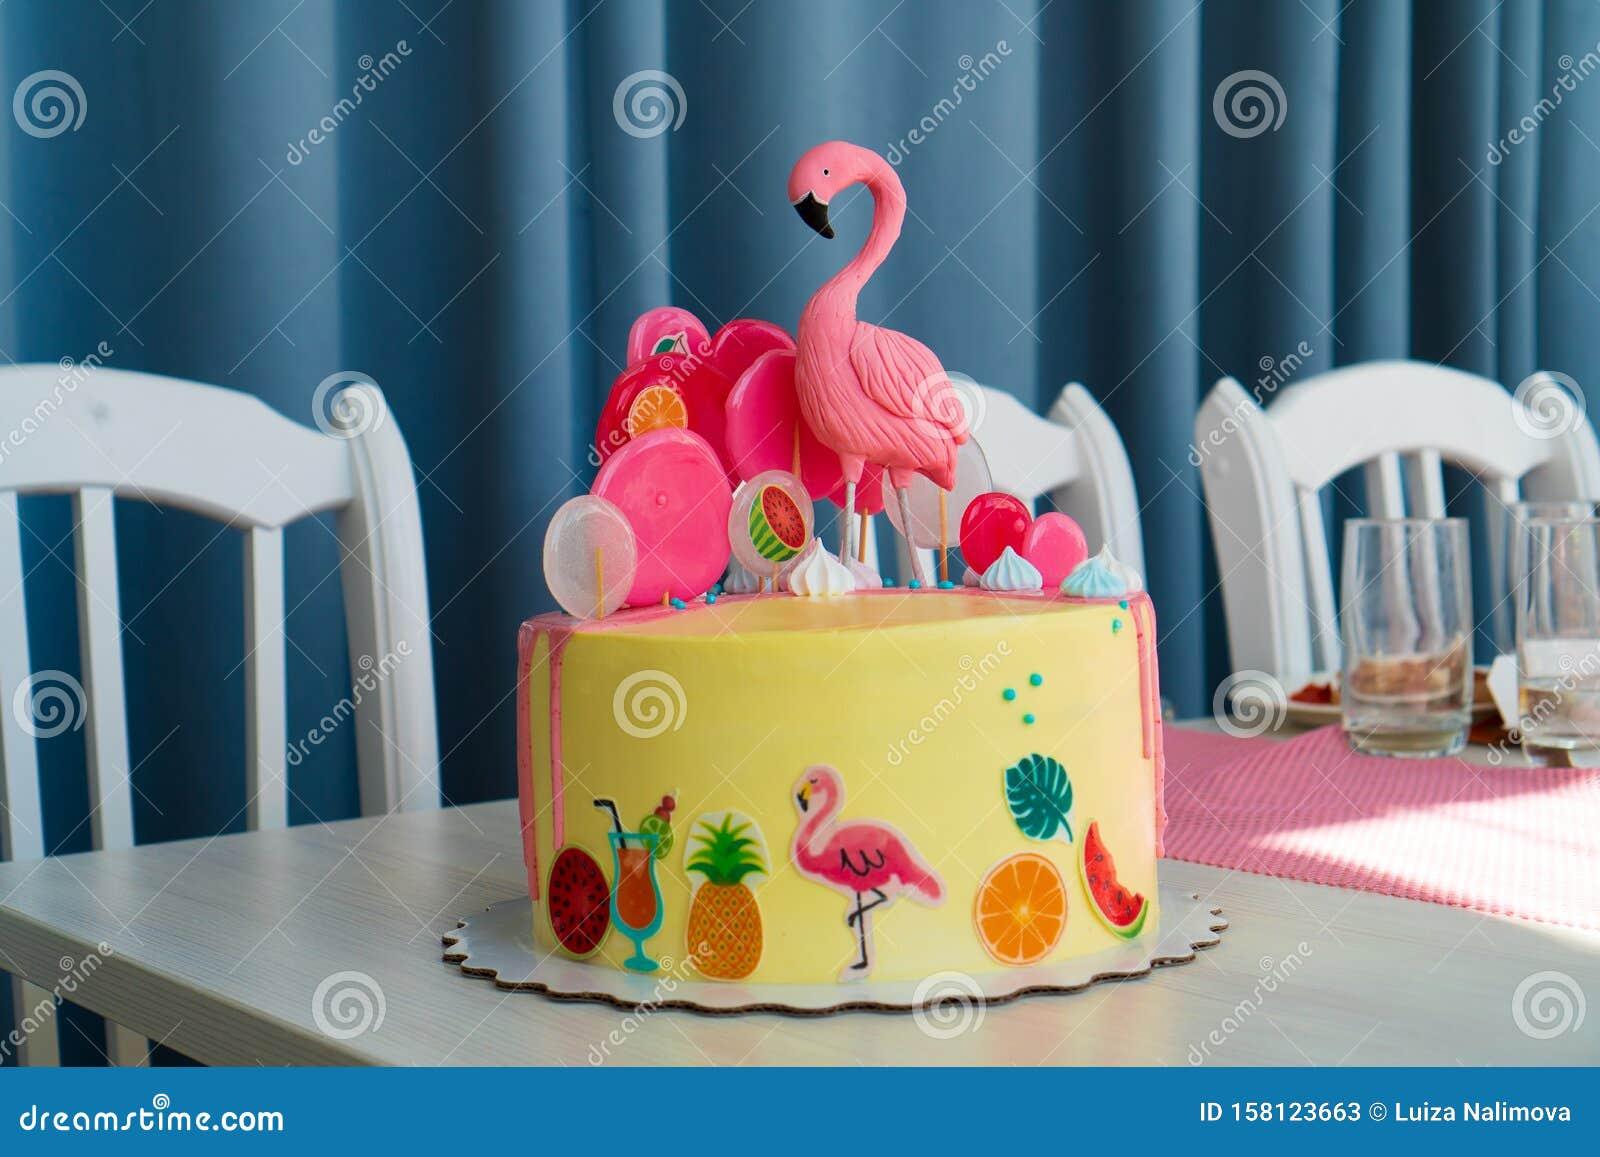 Stupendous Flamingo Cake At The Hawaiian Party Childrens Birthday Cake Aon Funny Birthday Cards Online Fluifree Goldxyz